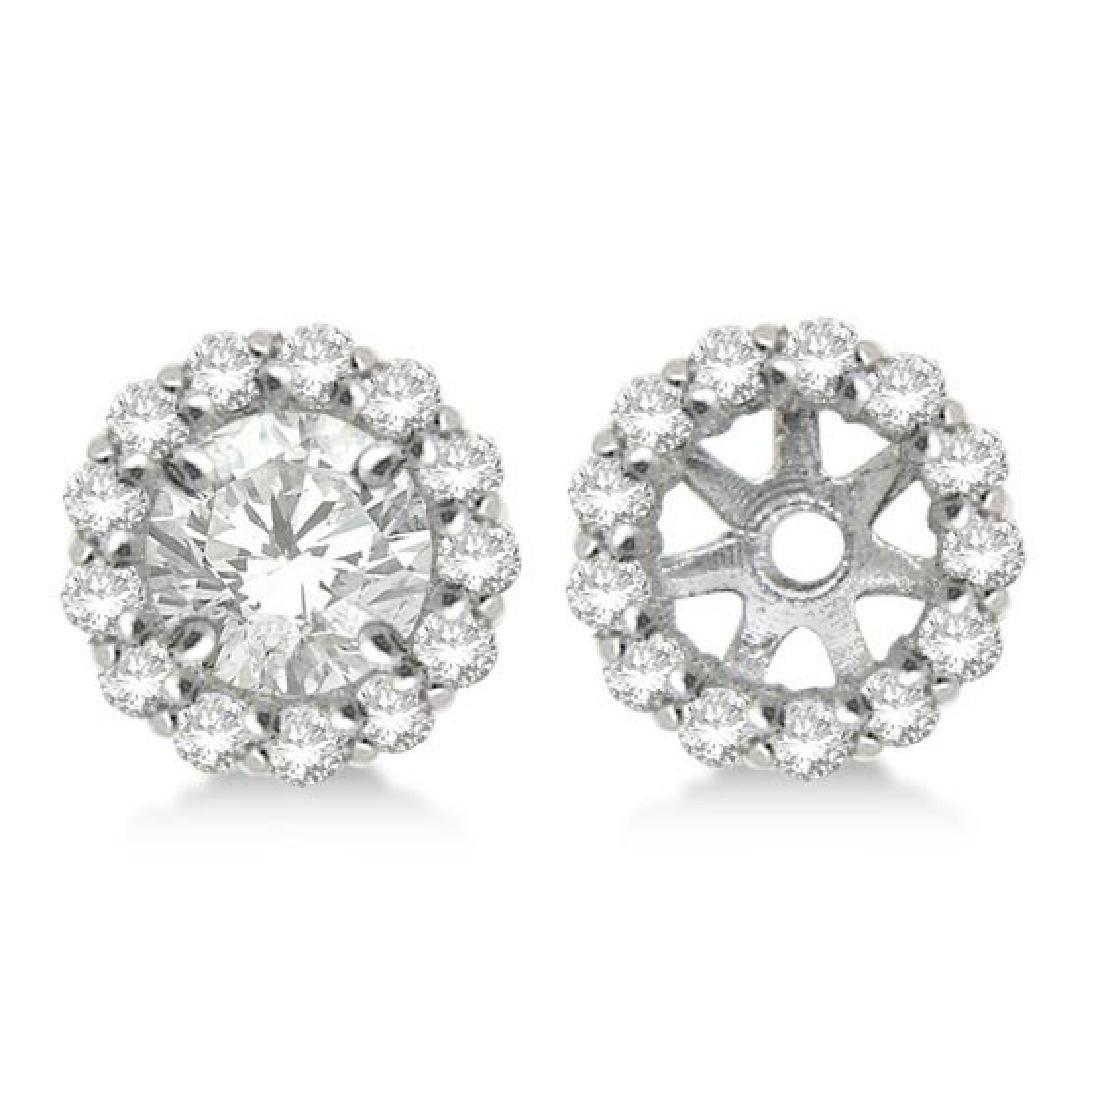 Round Diamond Earring Jackets for 9mm Studs 14K White G